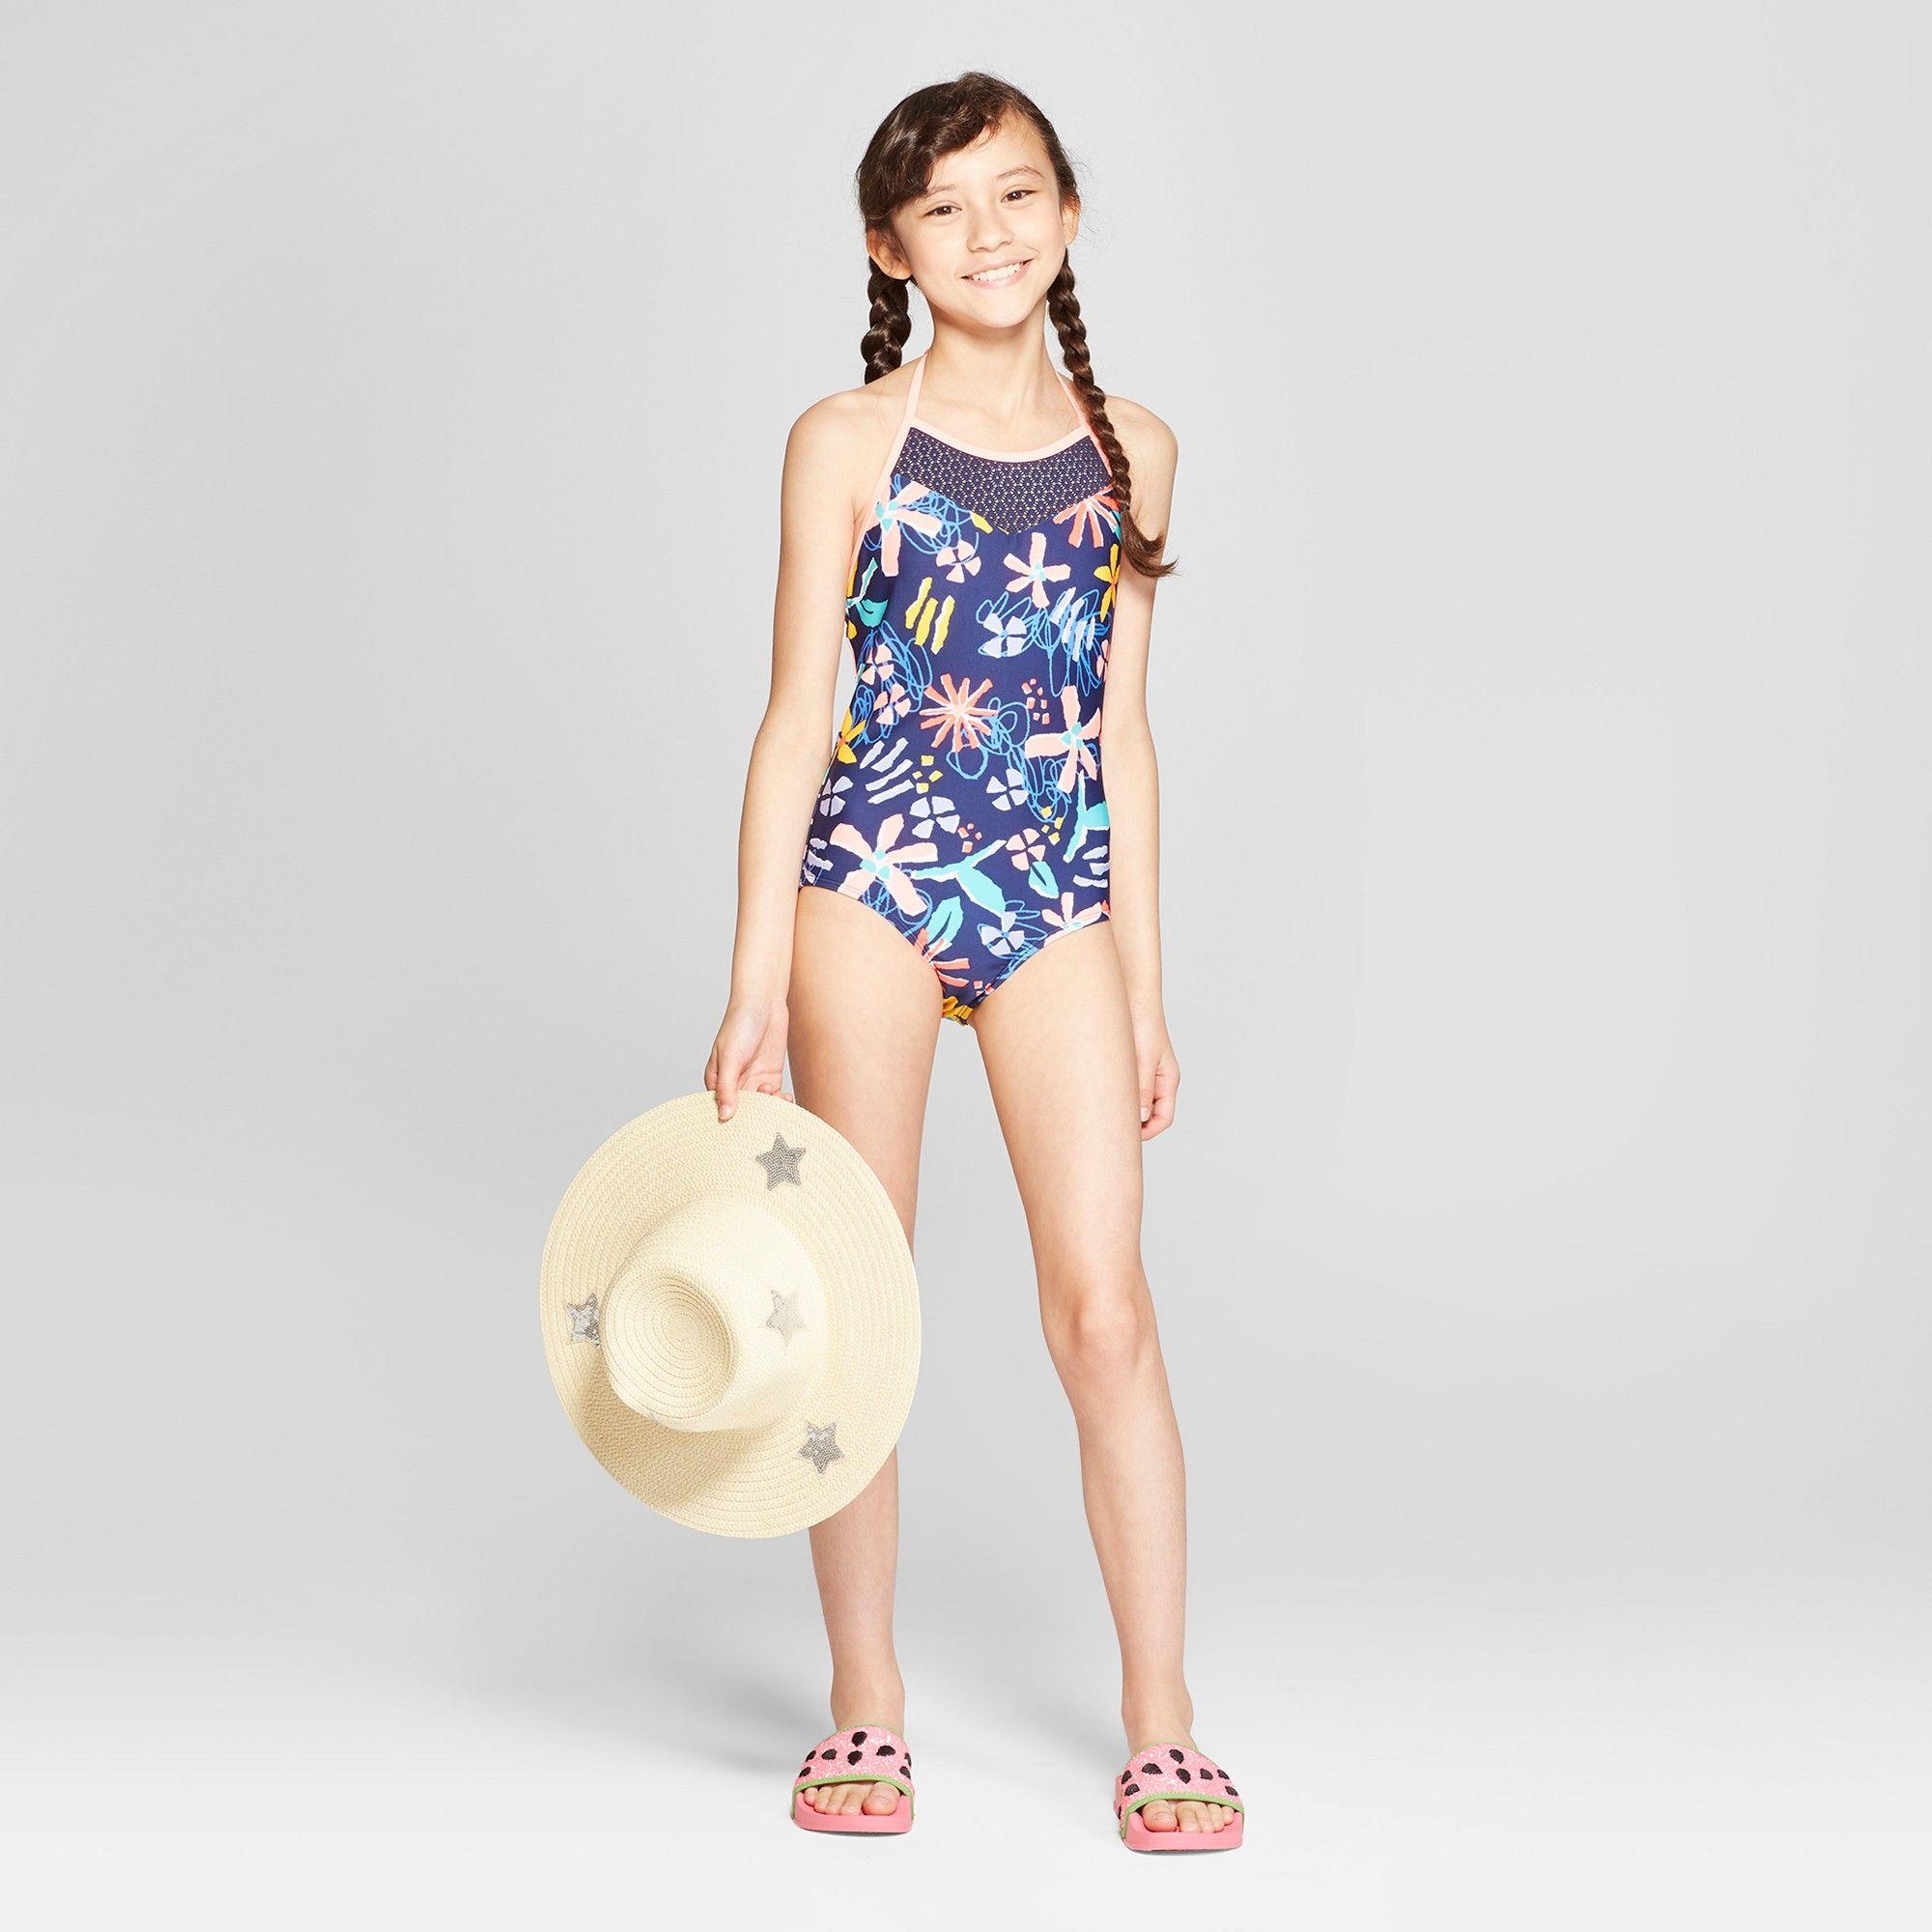 5042213878 Plus Size Girls' Loves Me Knot One Piece Swimsuit - Cat & Jack Navy Xxl  Plus, Blue